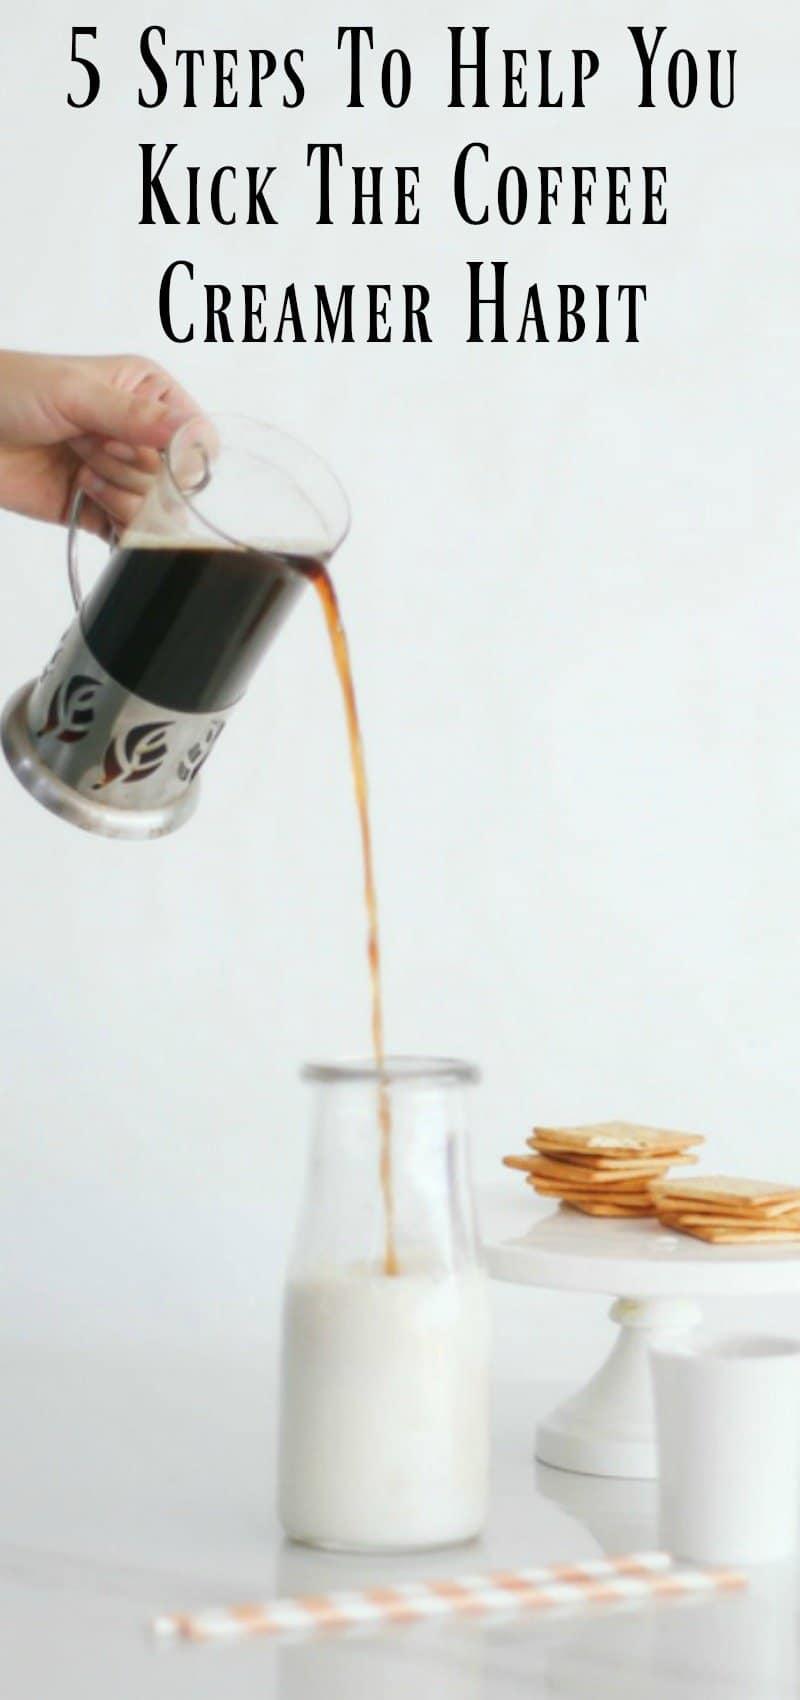 5 Steps to Help You Kick The Coffee Creamer Habit